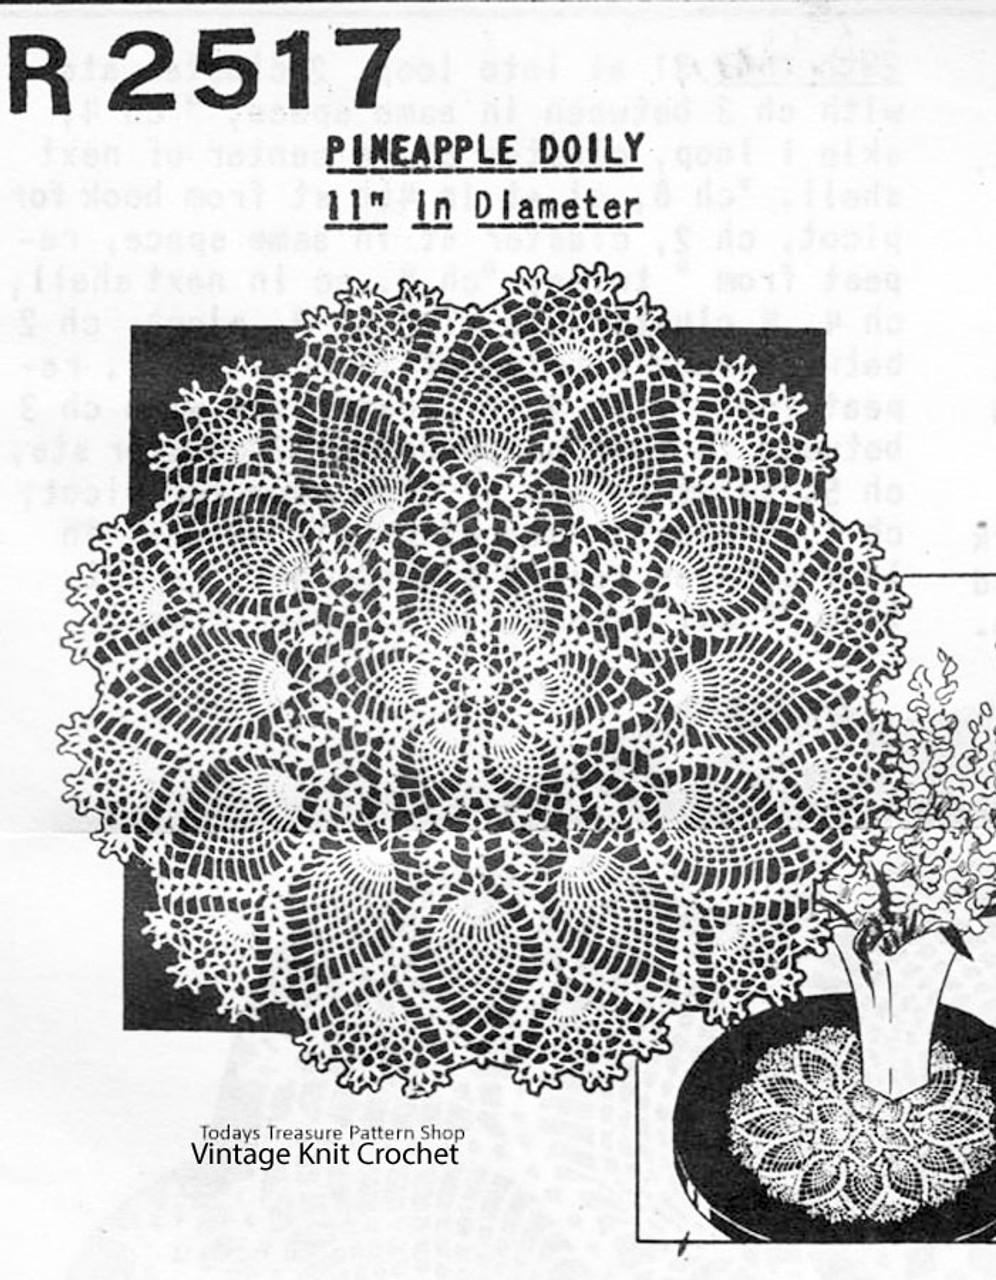 Medium Crochet Pineapple Doily pattern, Peggy Roberts R-2517